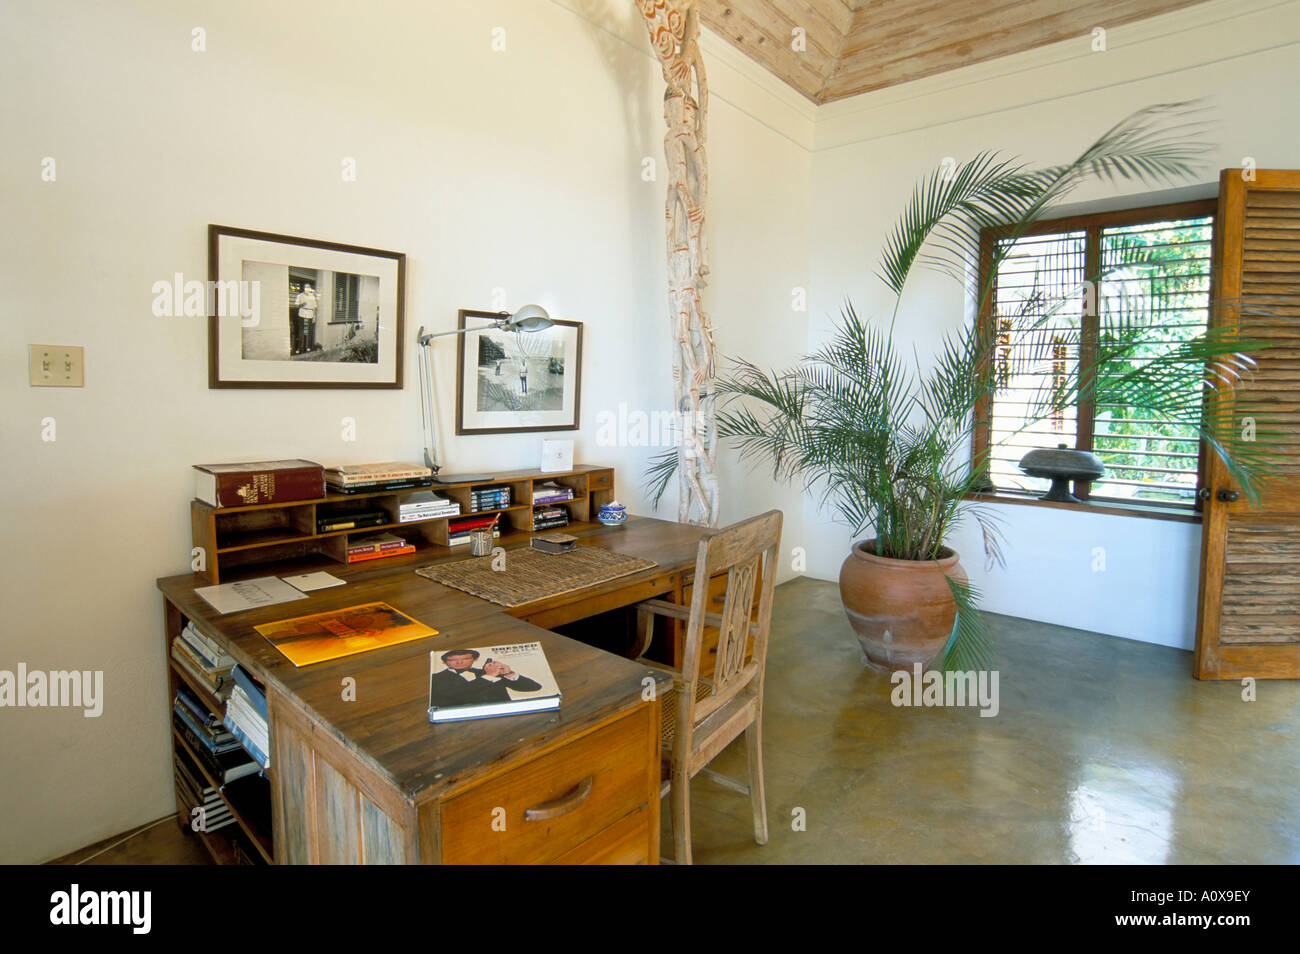 Hotel Di Lusso Interni : Photoring fotografo d interni hotel hotel di lusso lago di